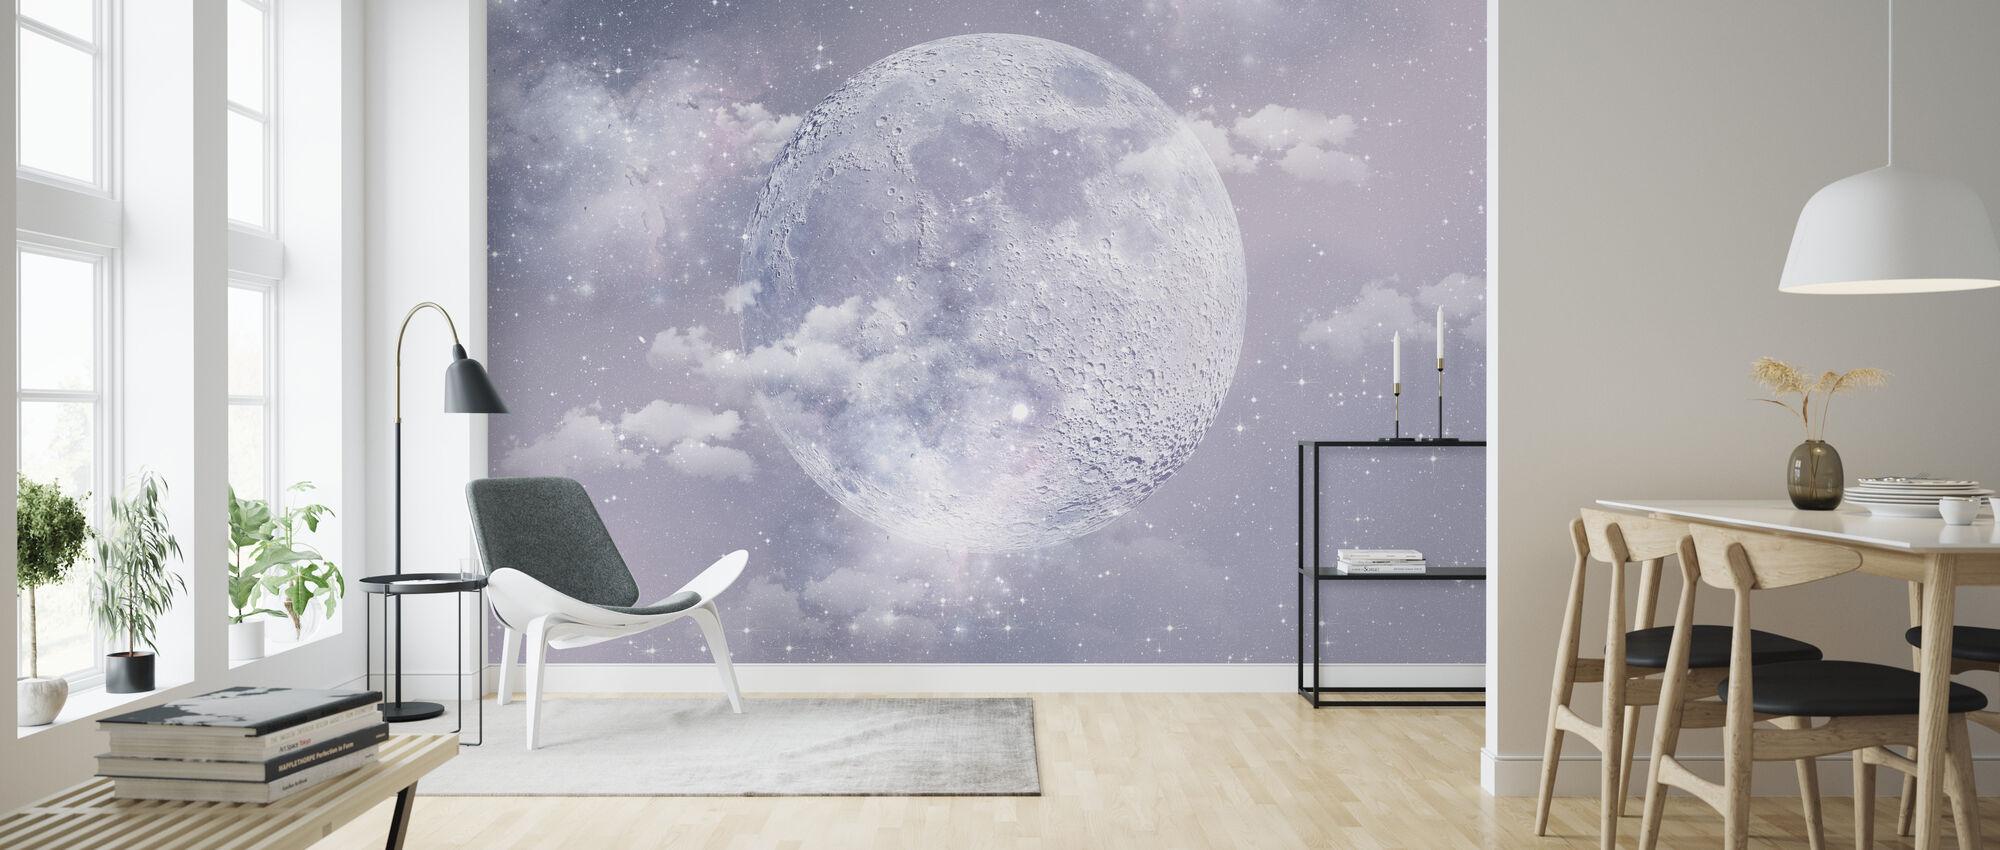 Moon - Wallpaper - Living Room